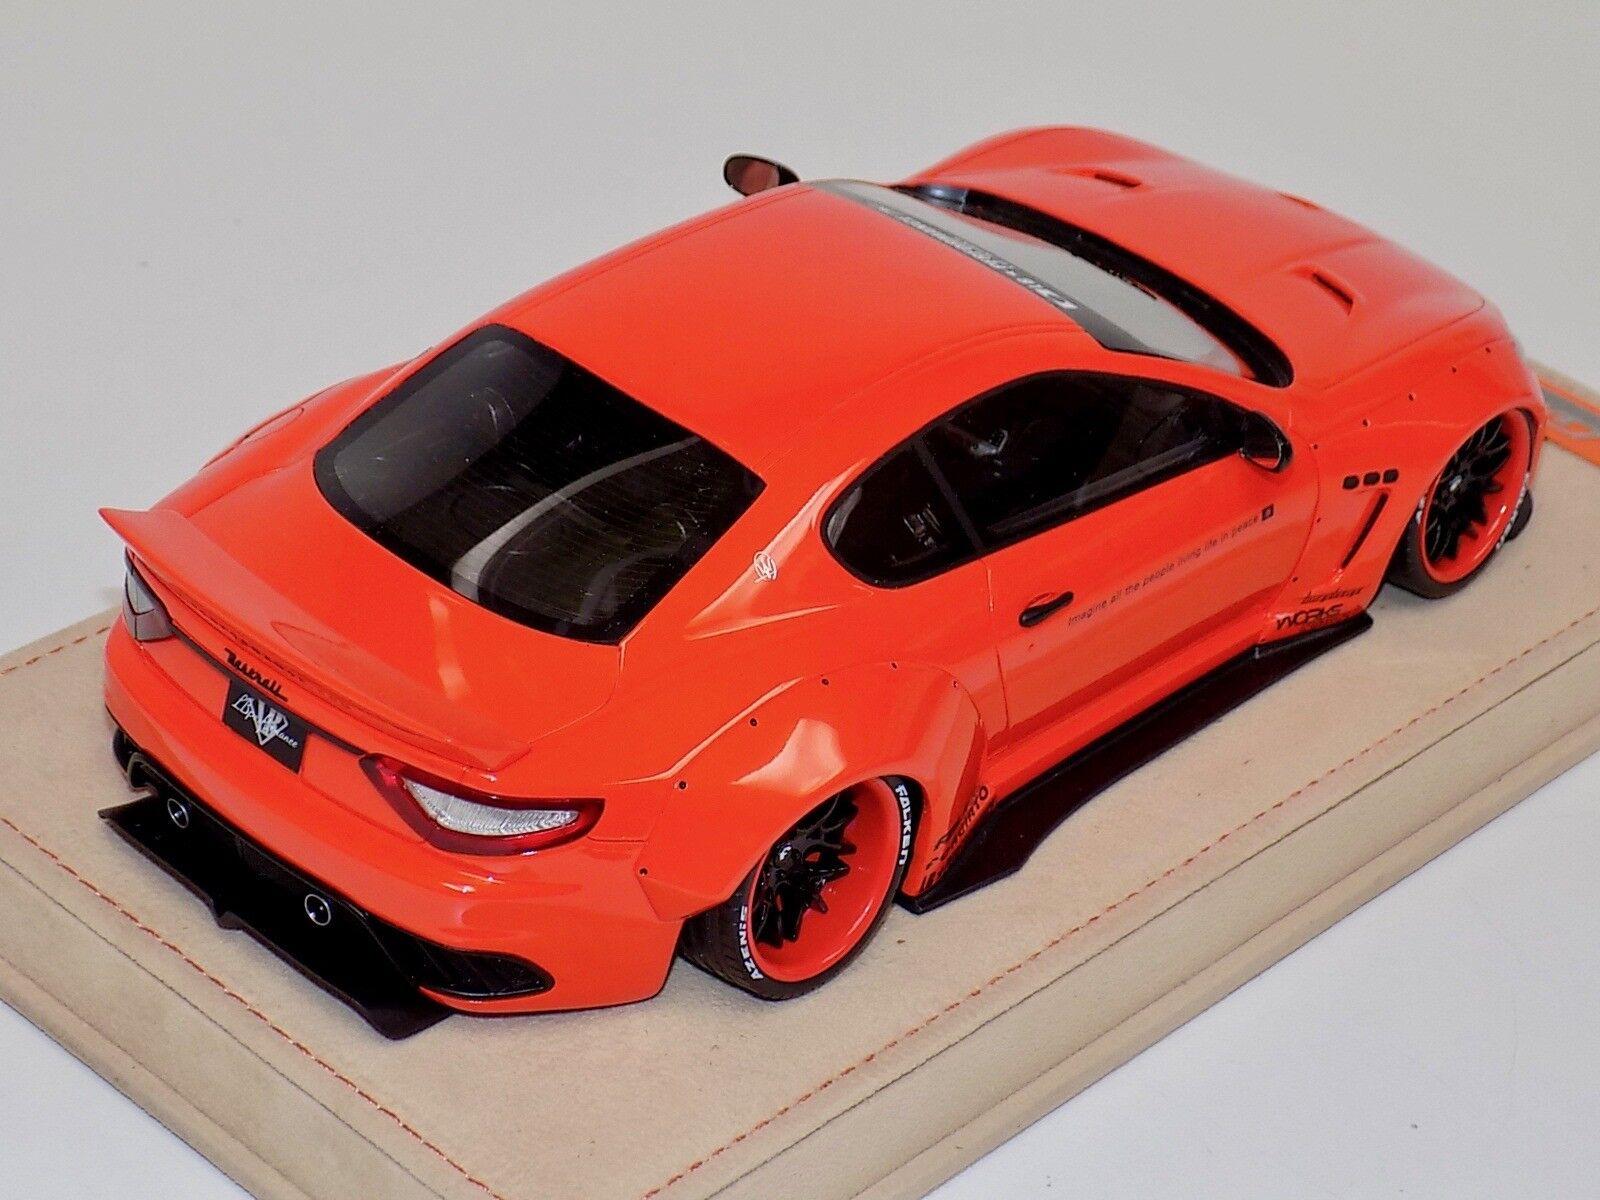 1 18 AB Models Models Models Maserati Granturismo Liberty walk orange, orange Whls Alcantara B 025f93